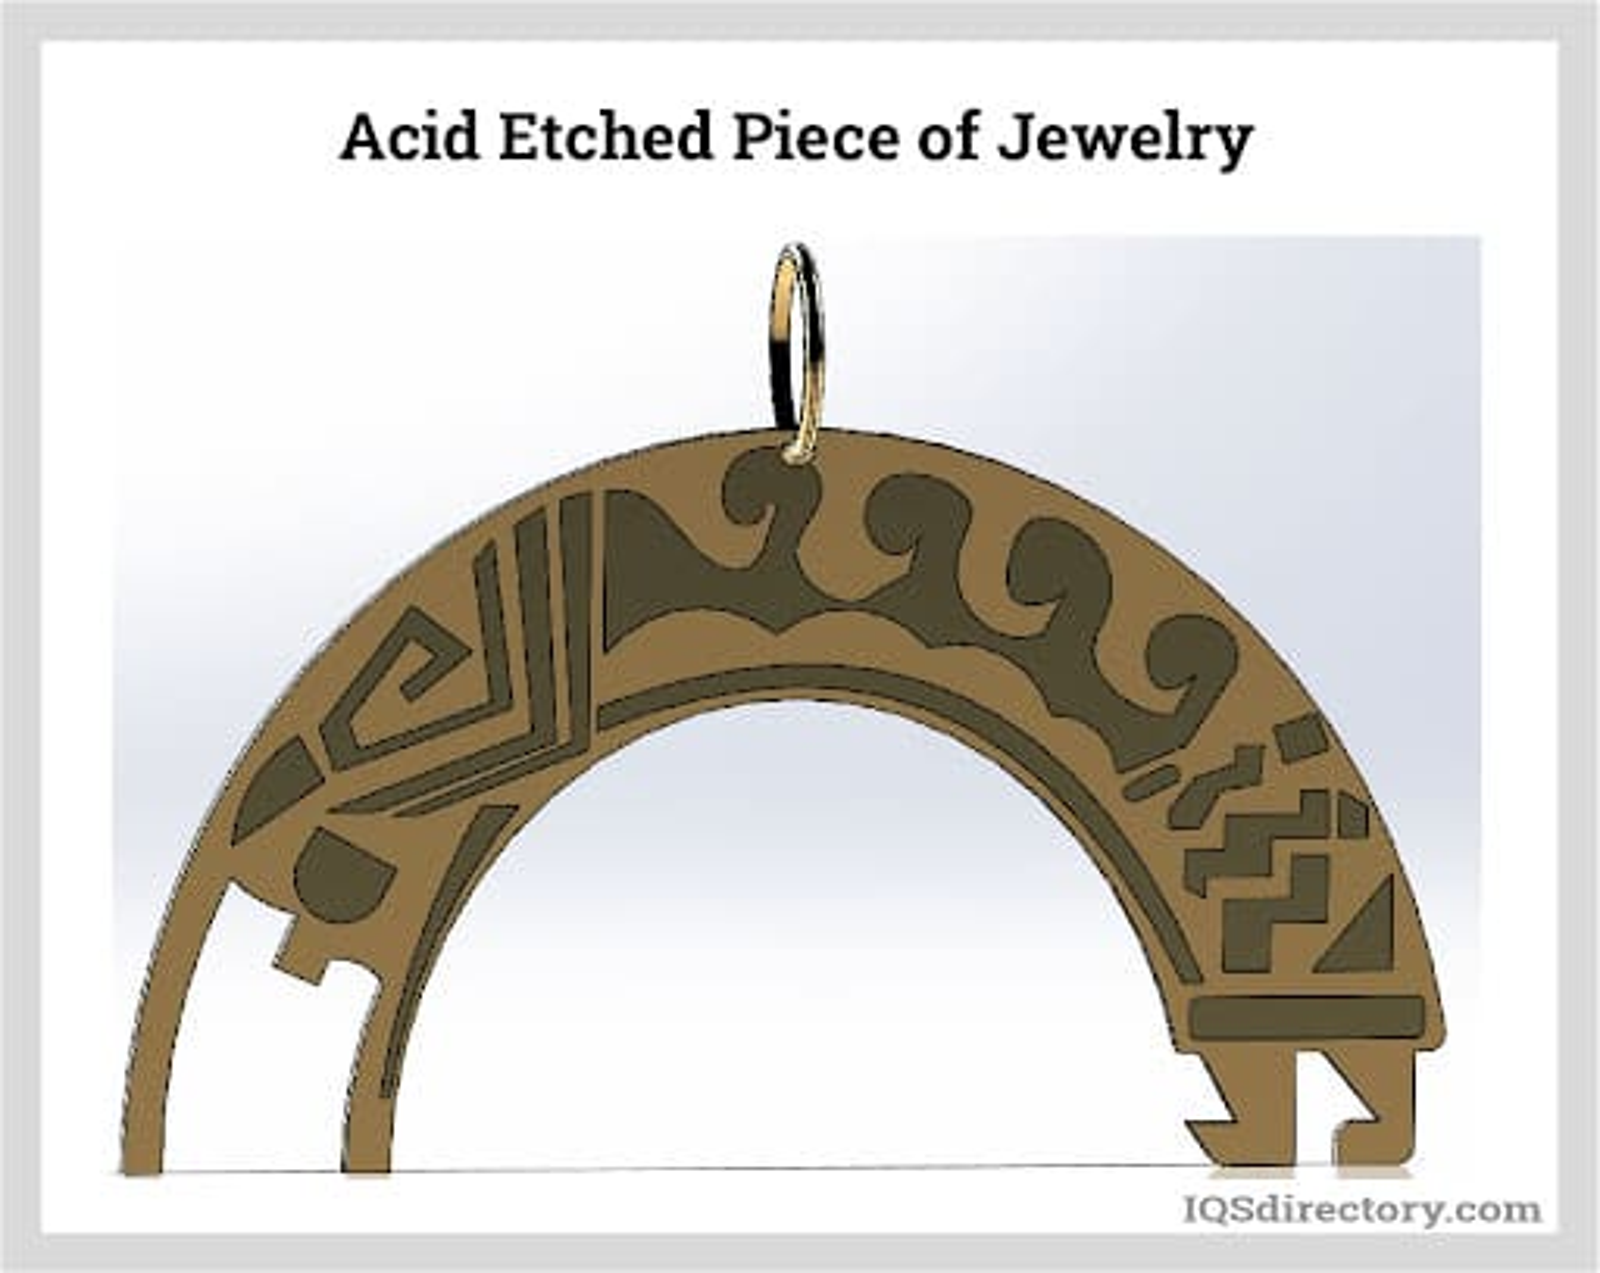 Acid Etched Piece of Jewelry